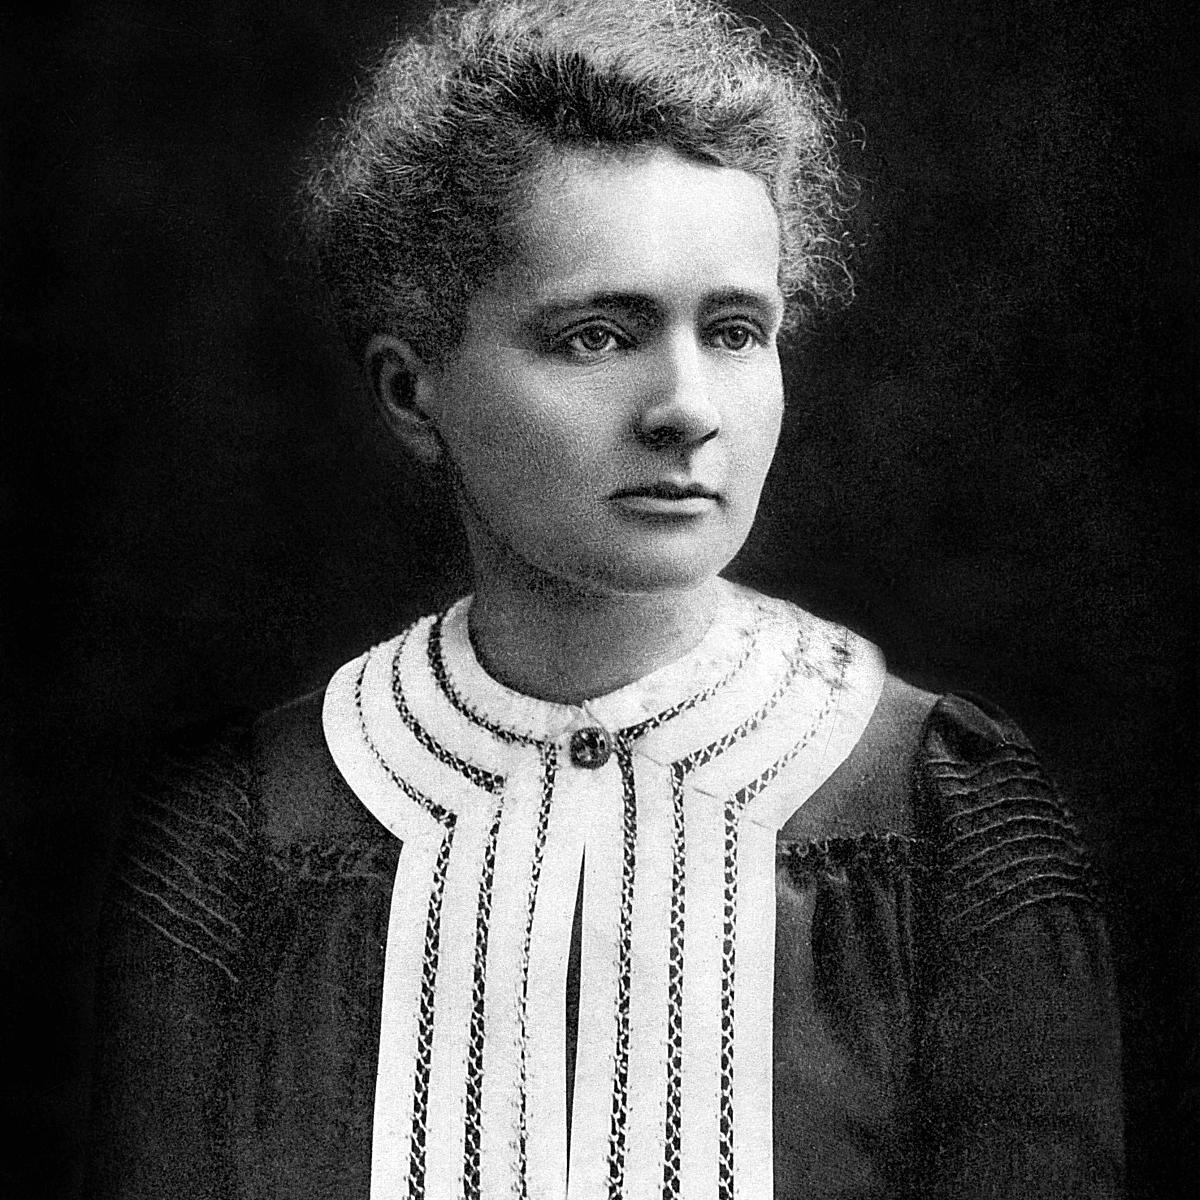 Marie Curie in Nobel Prize portrait, 1903